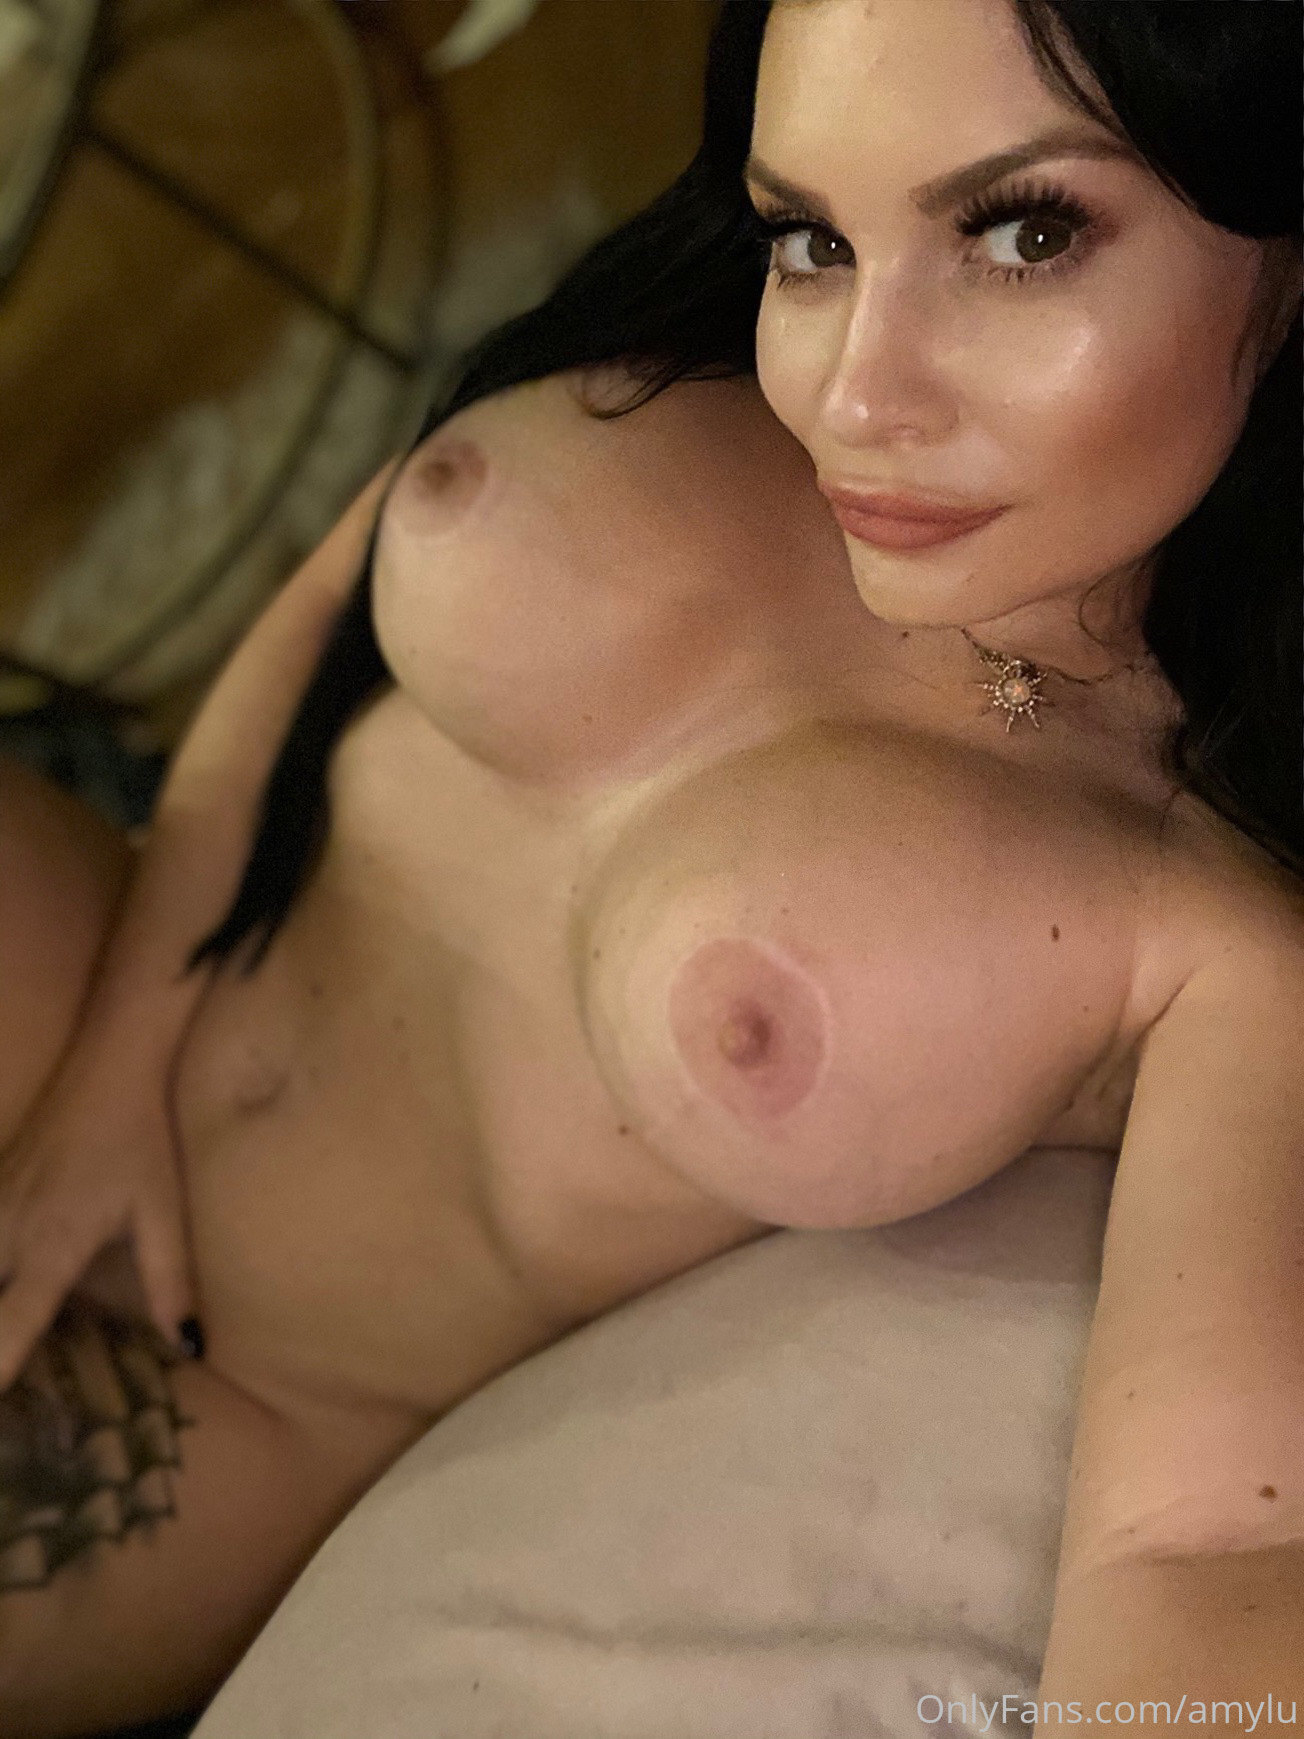 Amylu  - Strapon Mistress Amylu 08 04 2021 - onlyfans SiteRip